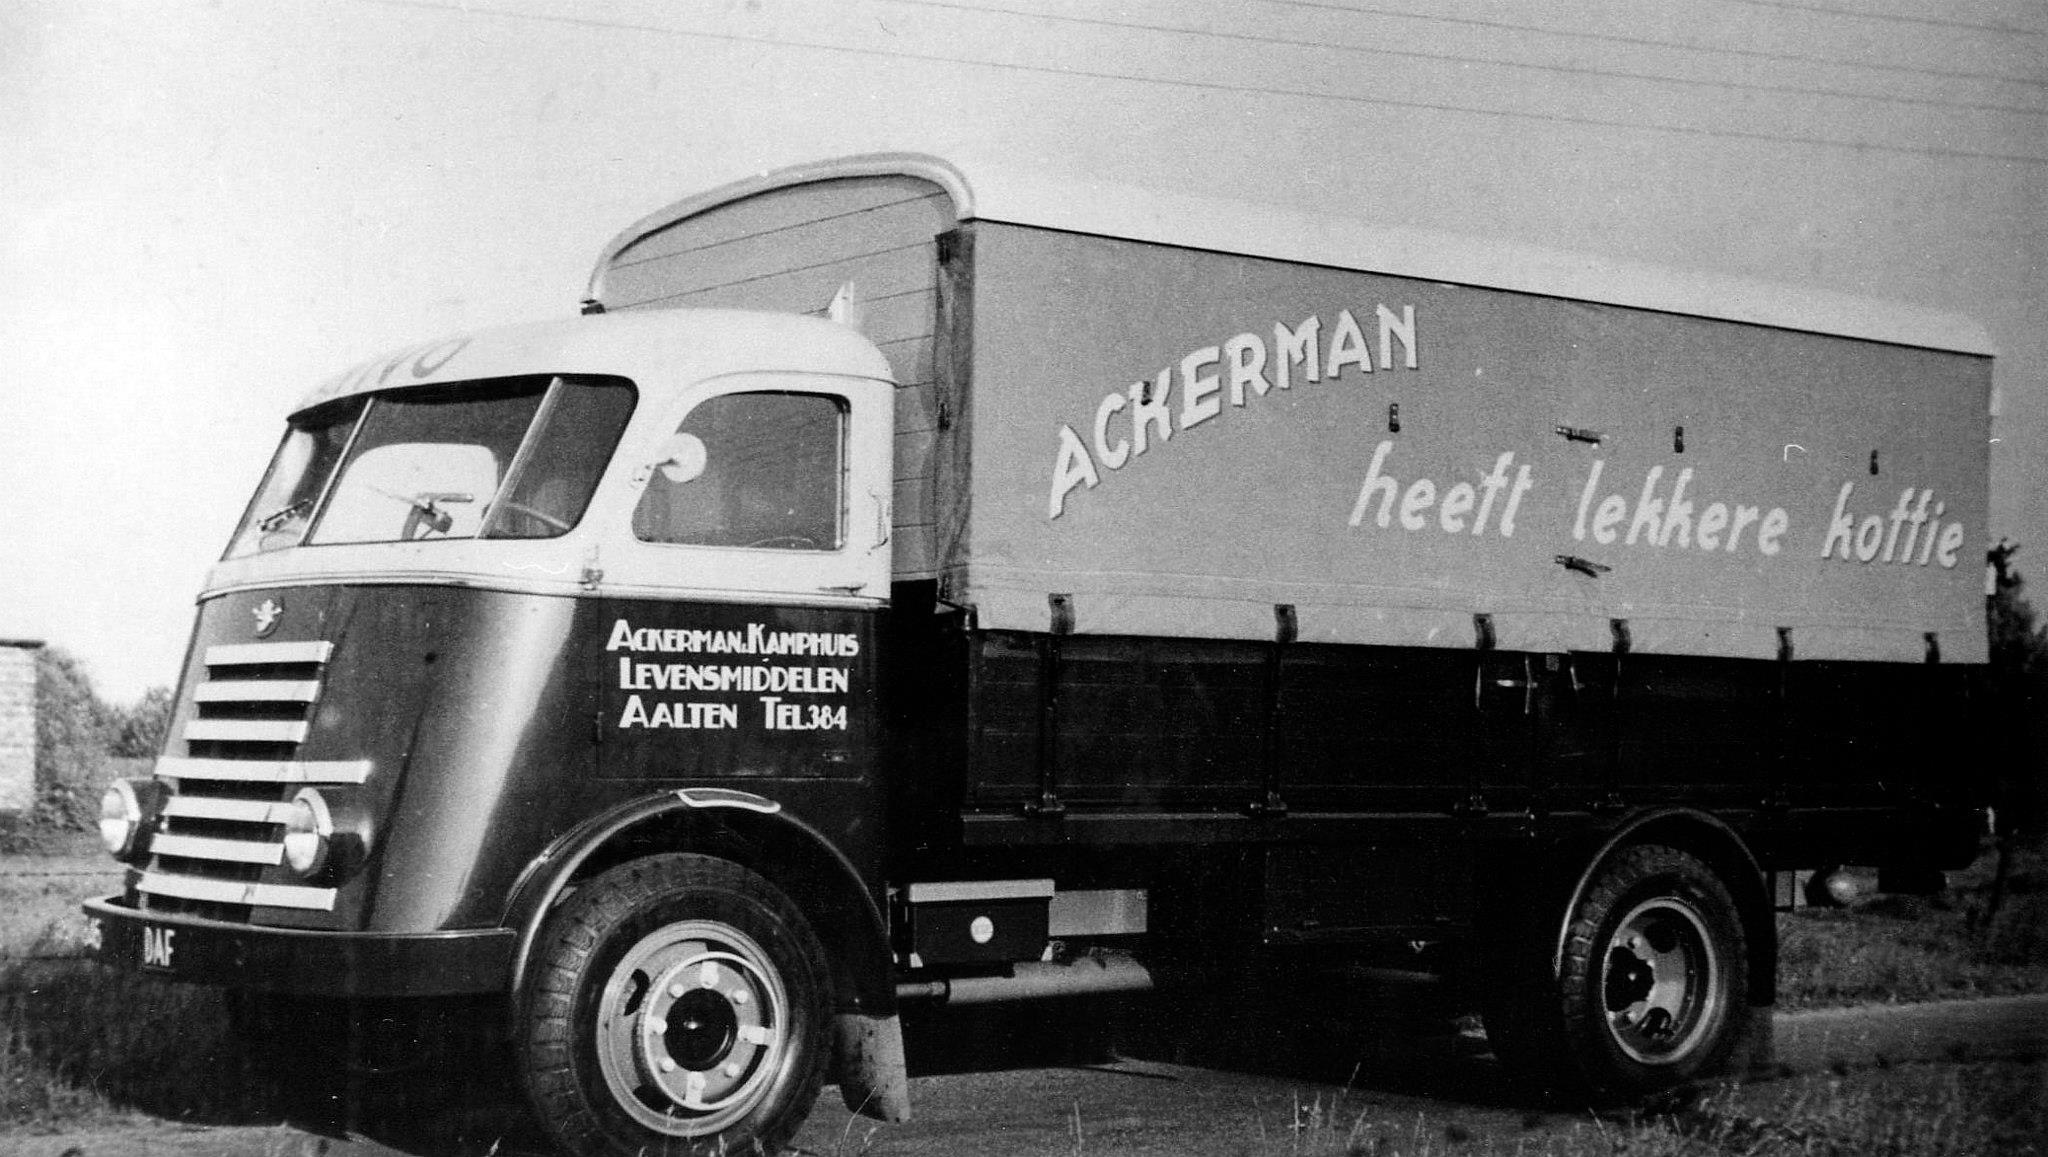 Ackerman-Levensmiddelen-Aalten